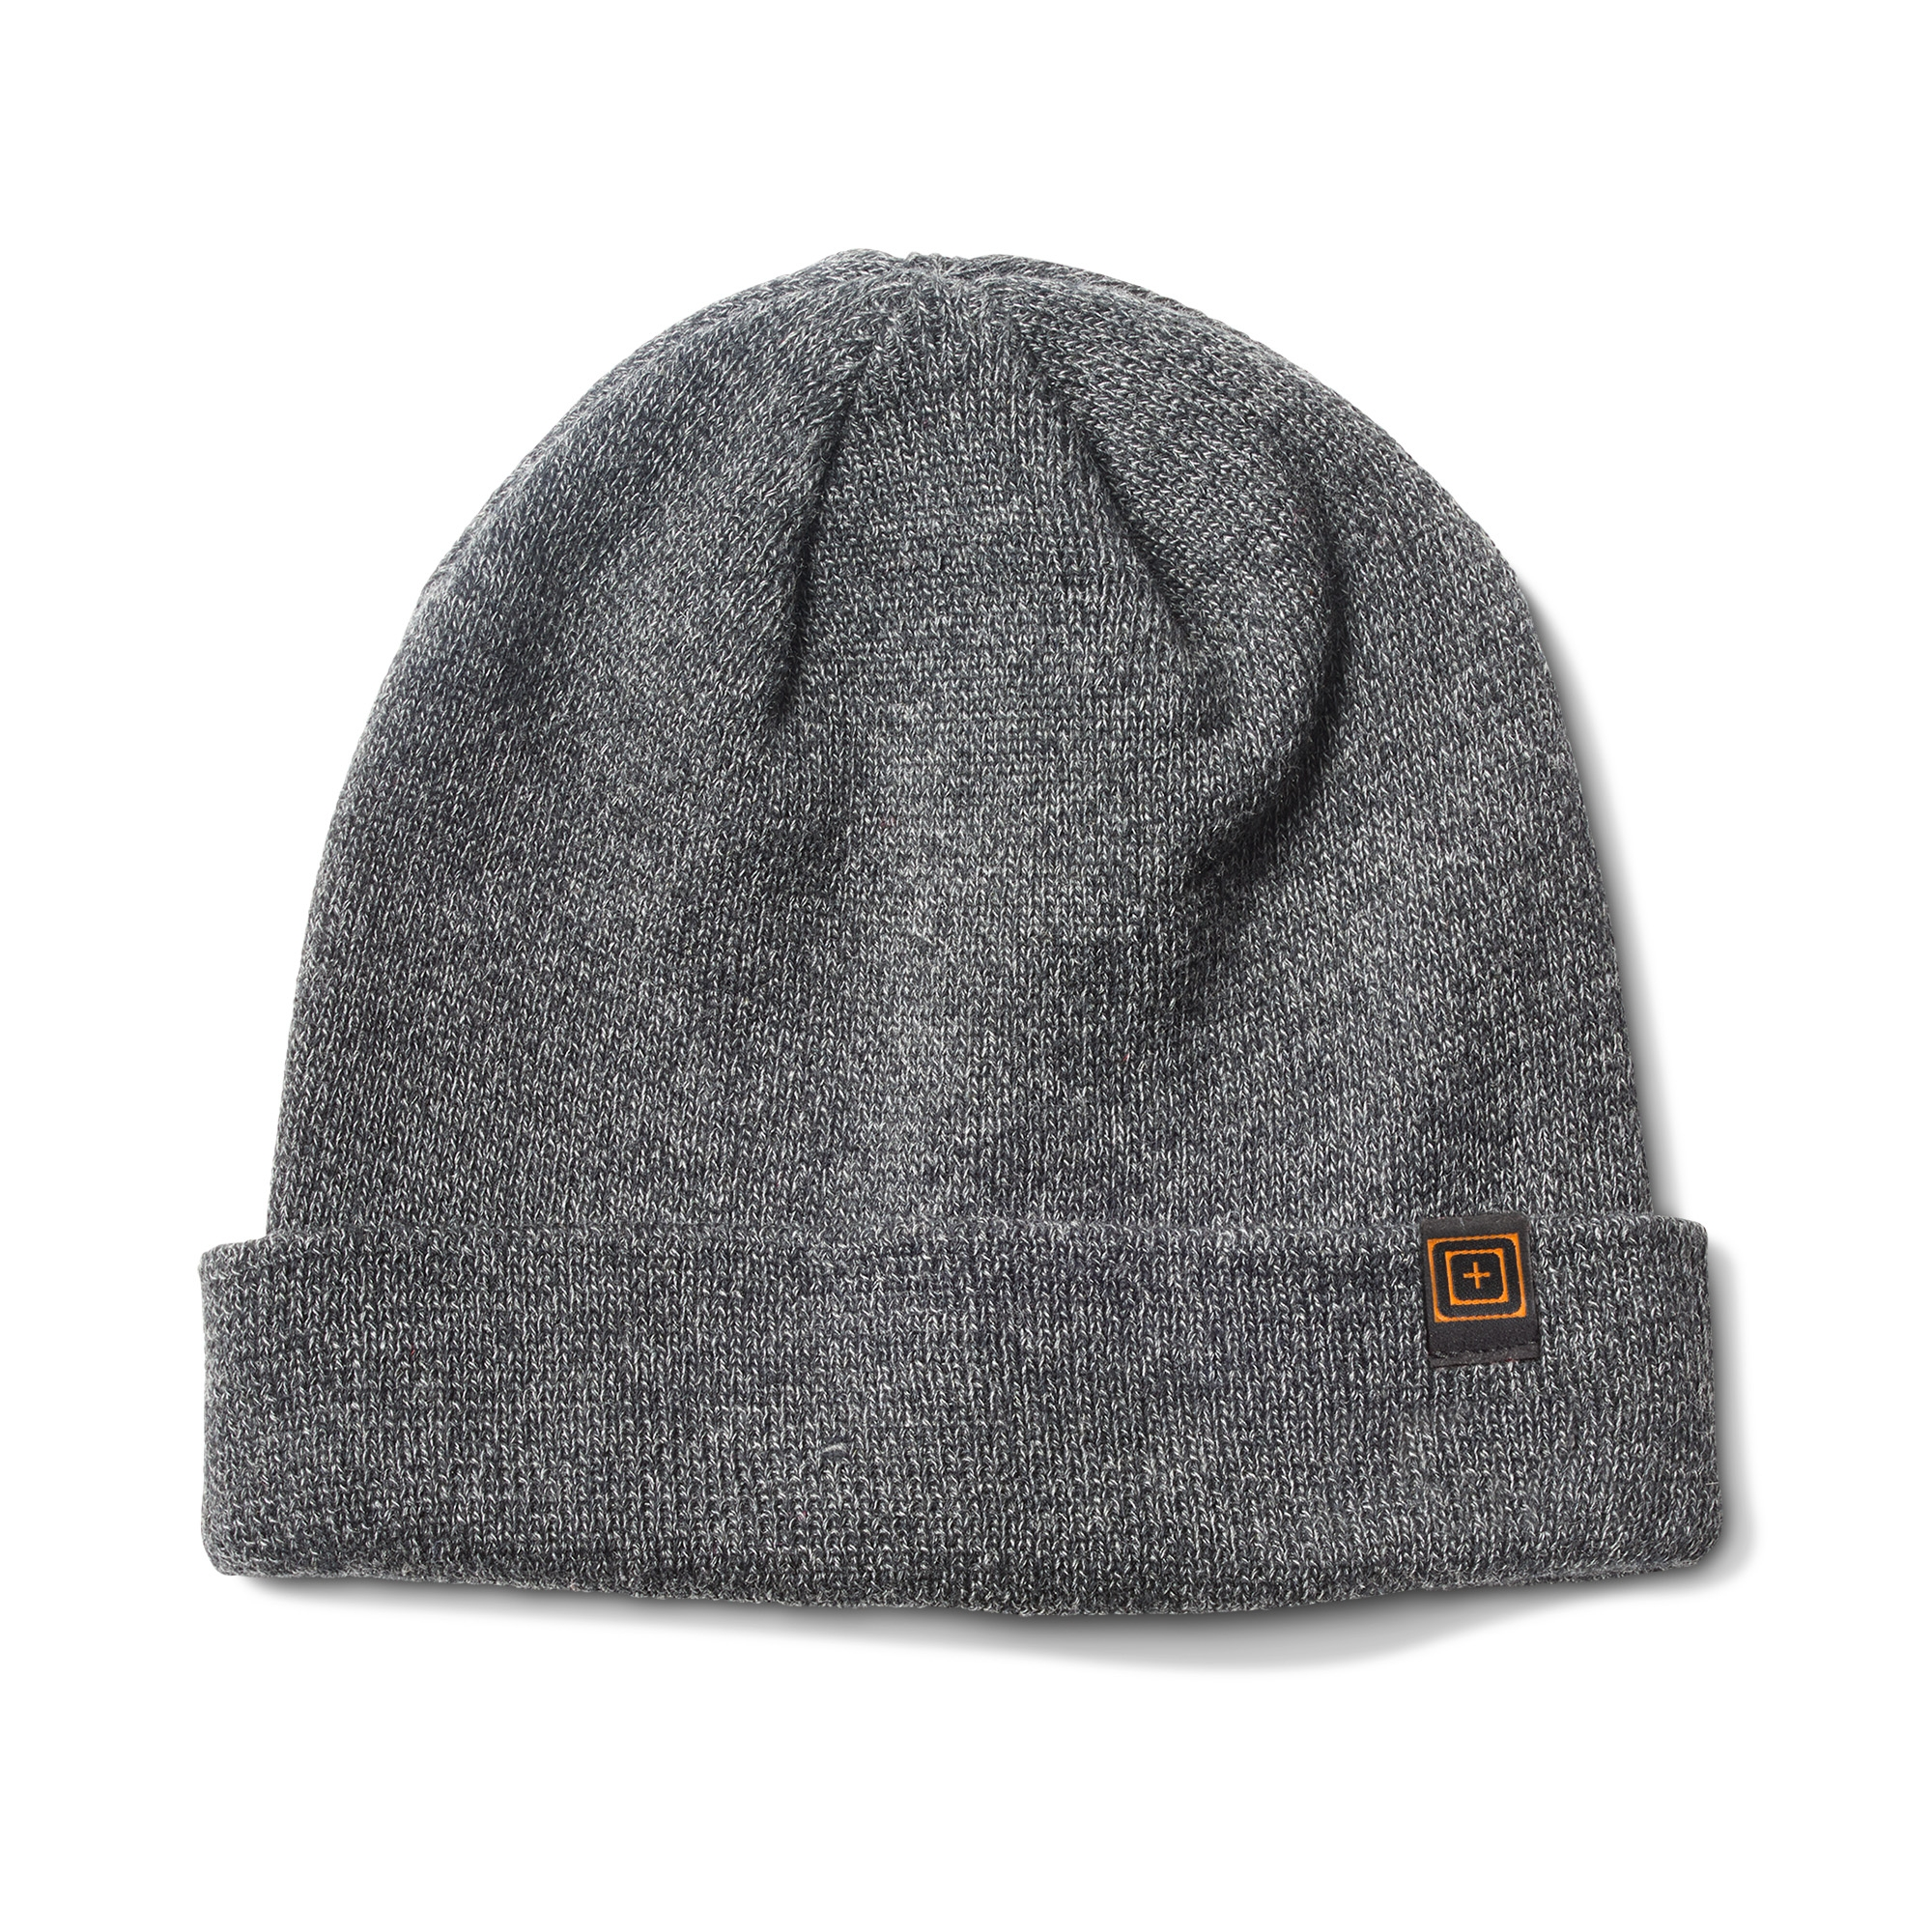 890695f98 discount smu knit 21eb0 cdf34